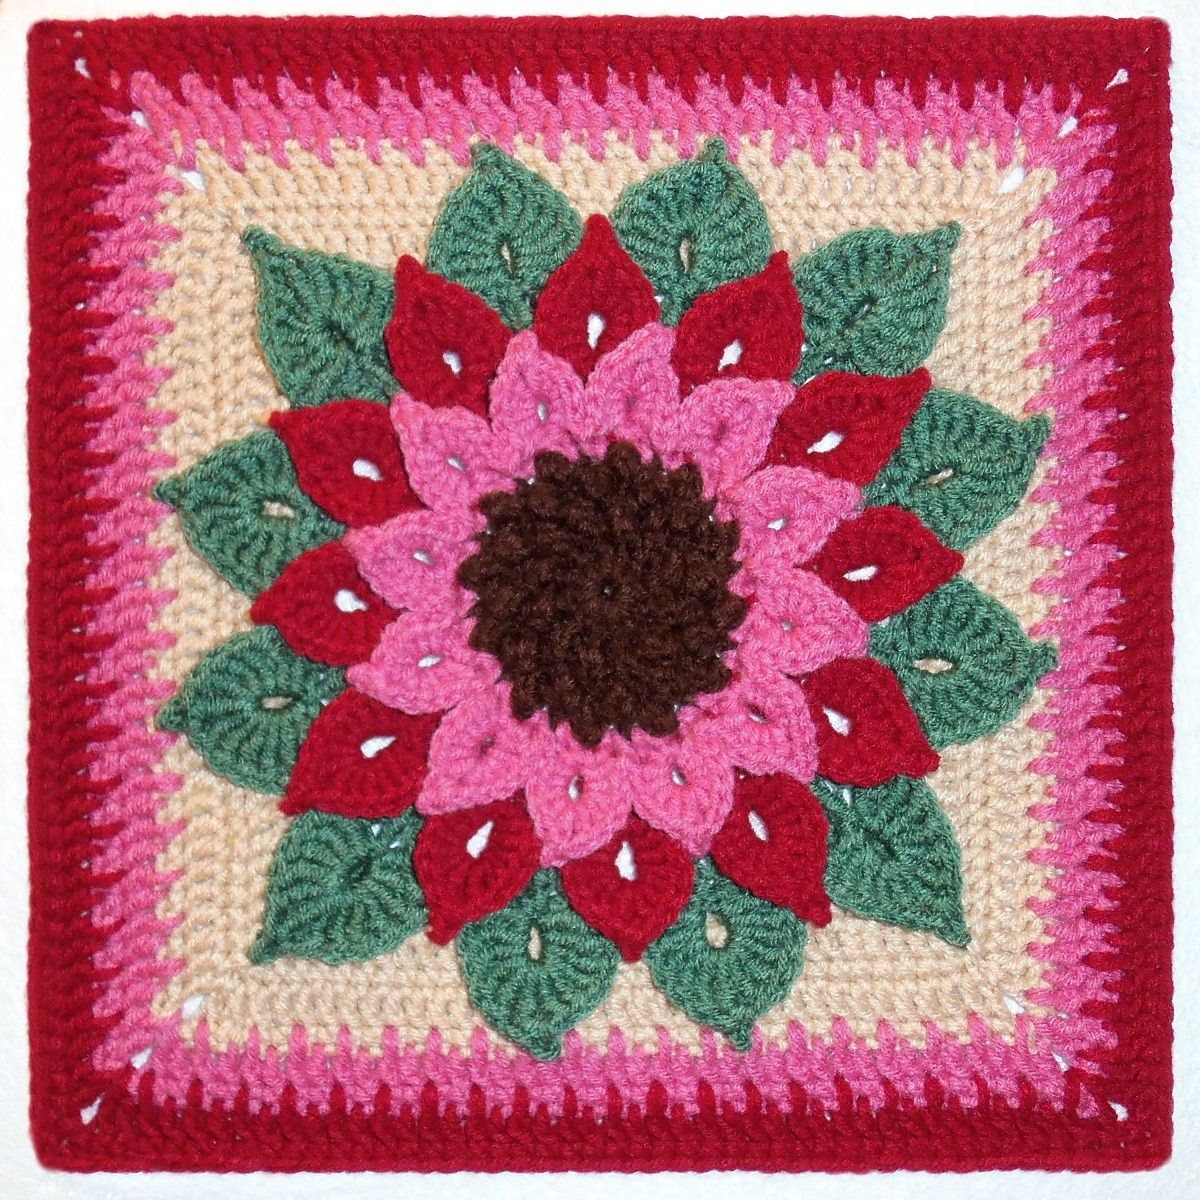 Ravelry: The Crocodile Flower by Joyce Lewis | crocheting ...